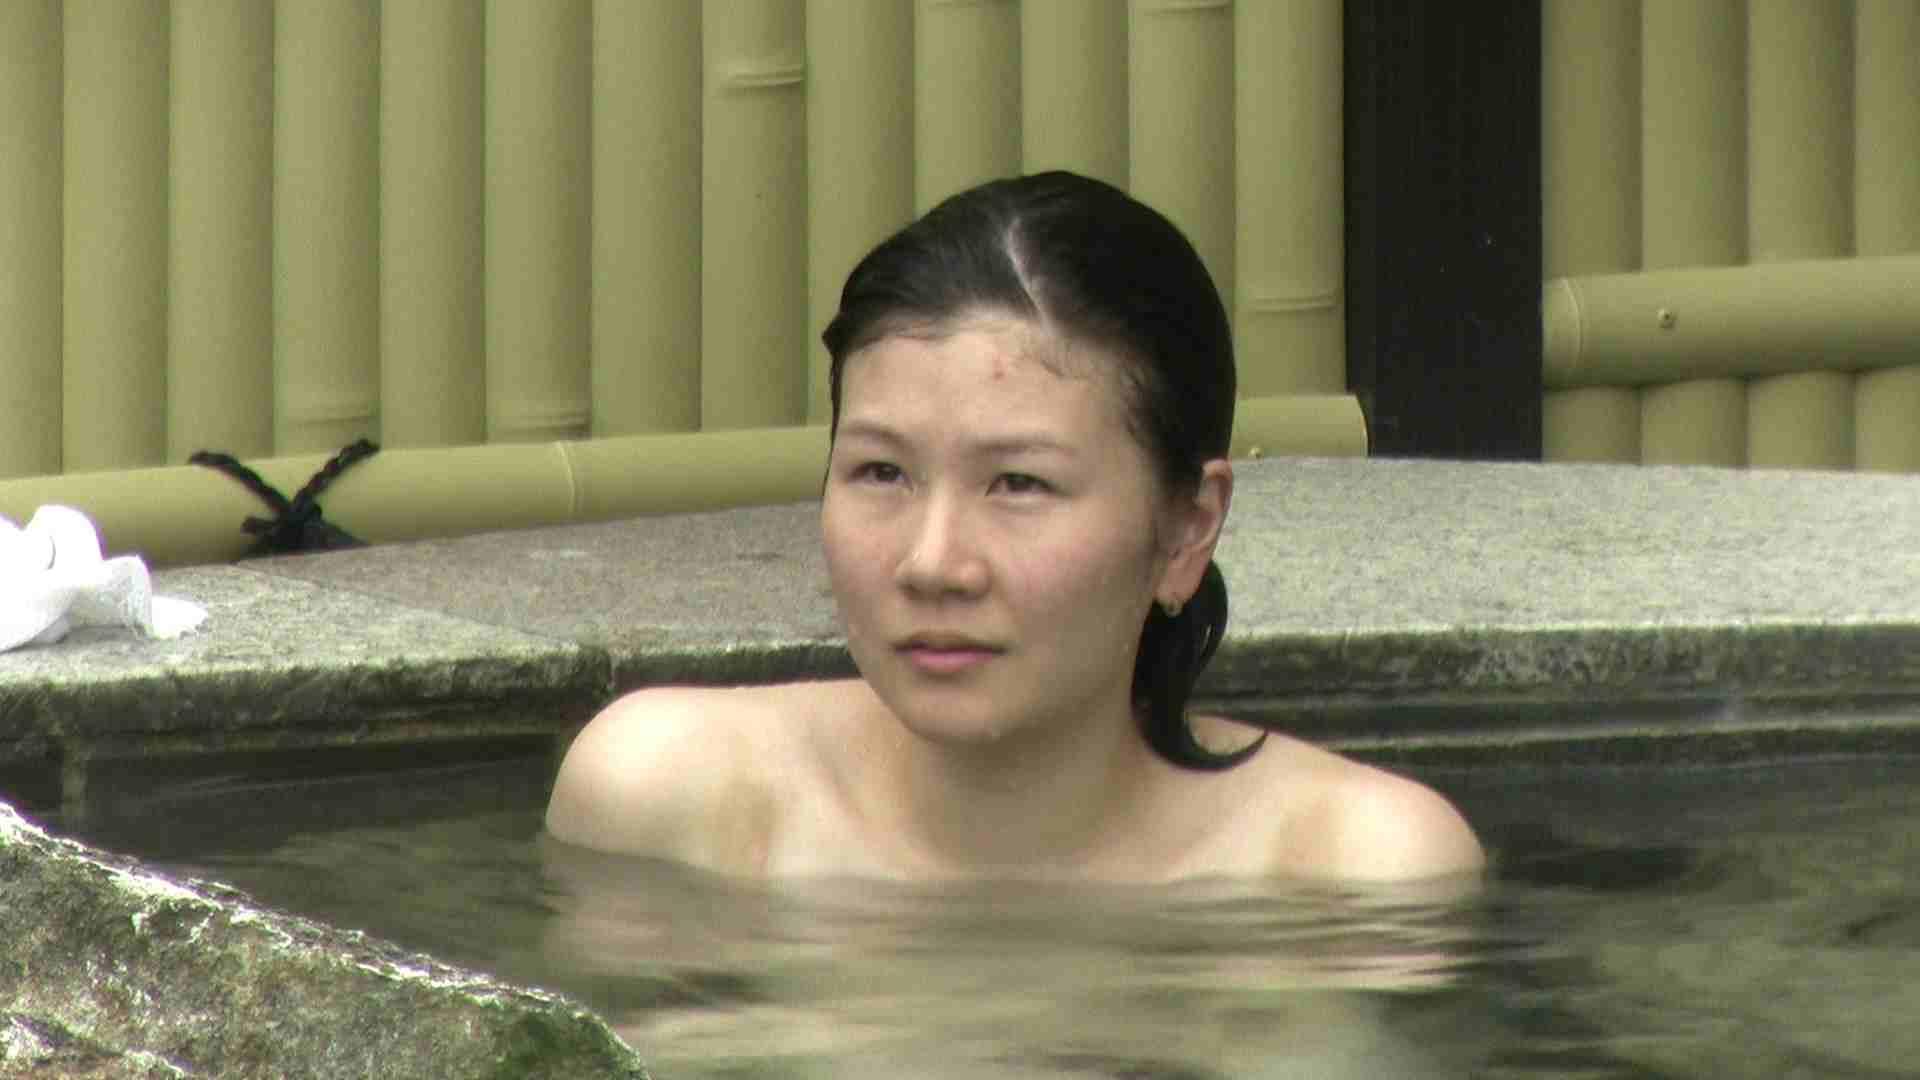 Aquaな露天風呂Vol.187 盗撮  63連発 23